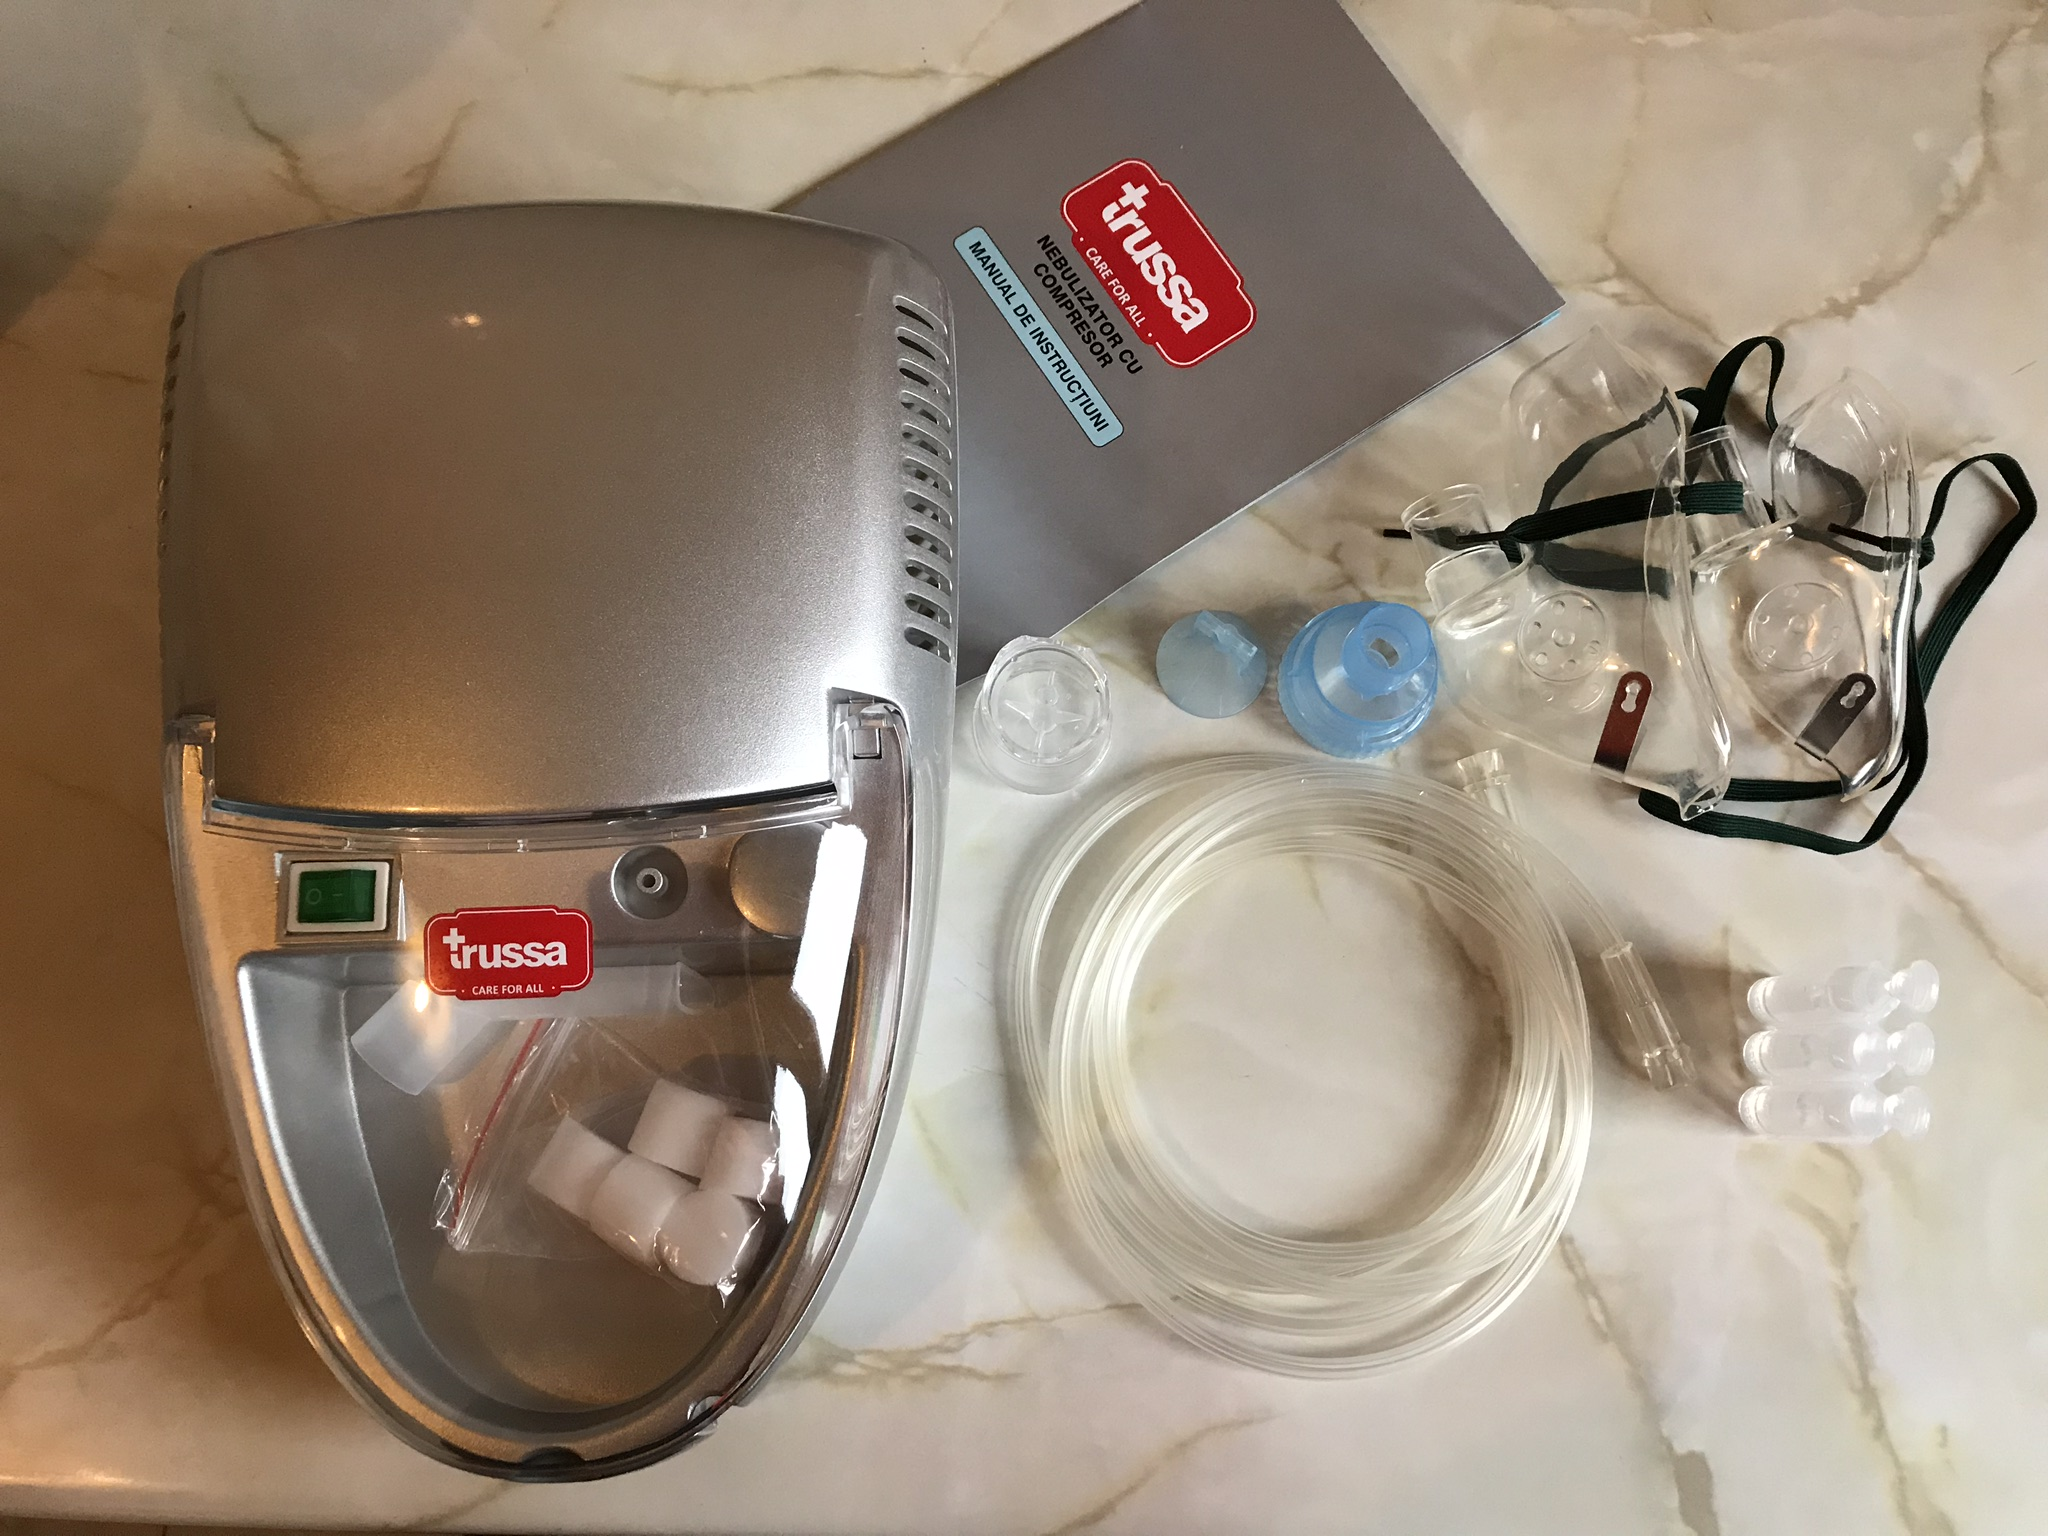 folosim aparat aerosoli nebulizator trussa miruna ioani1